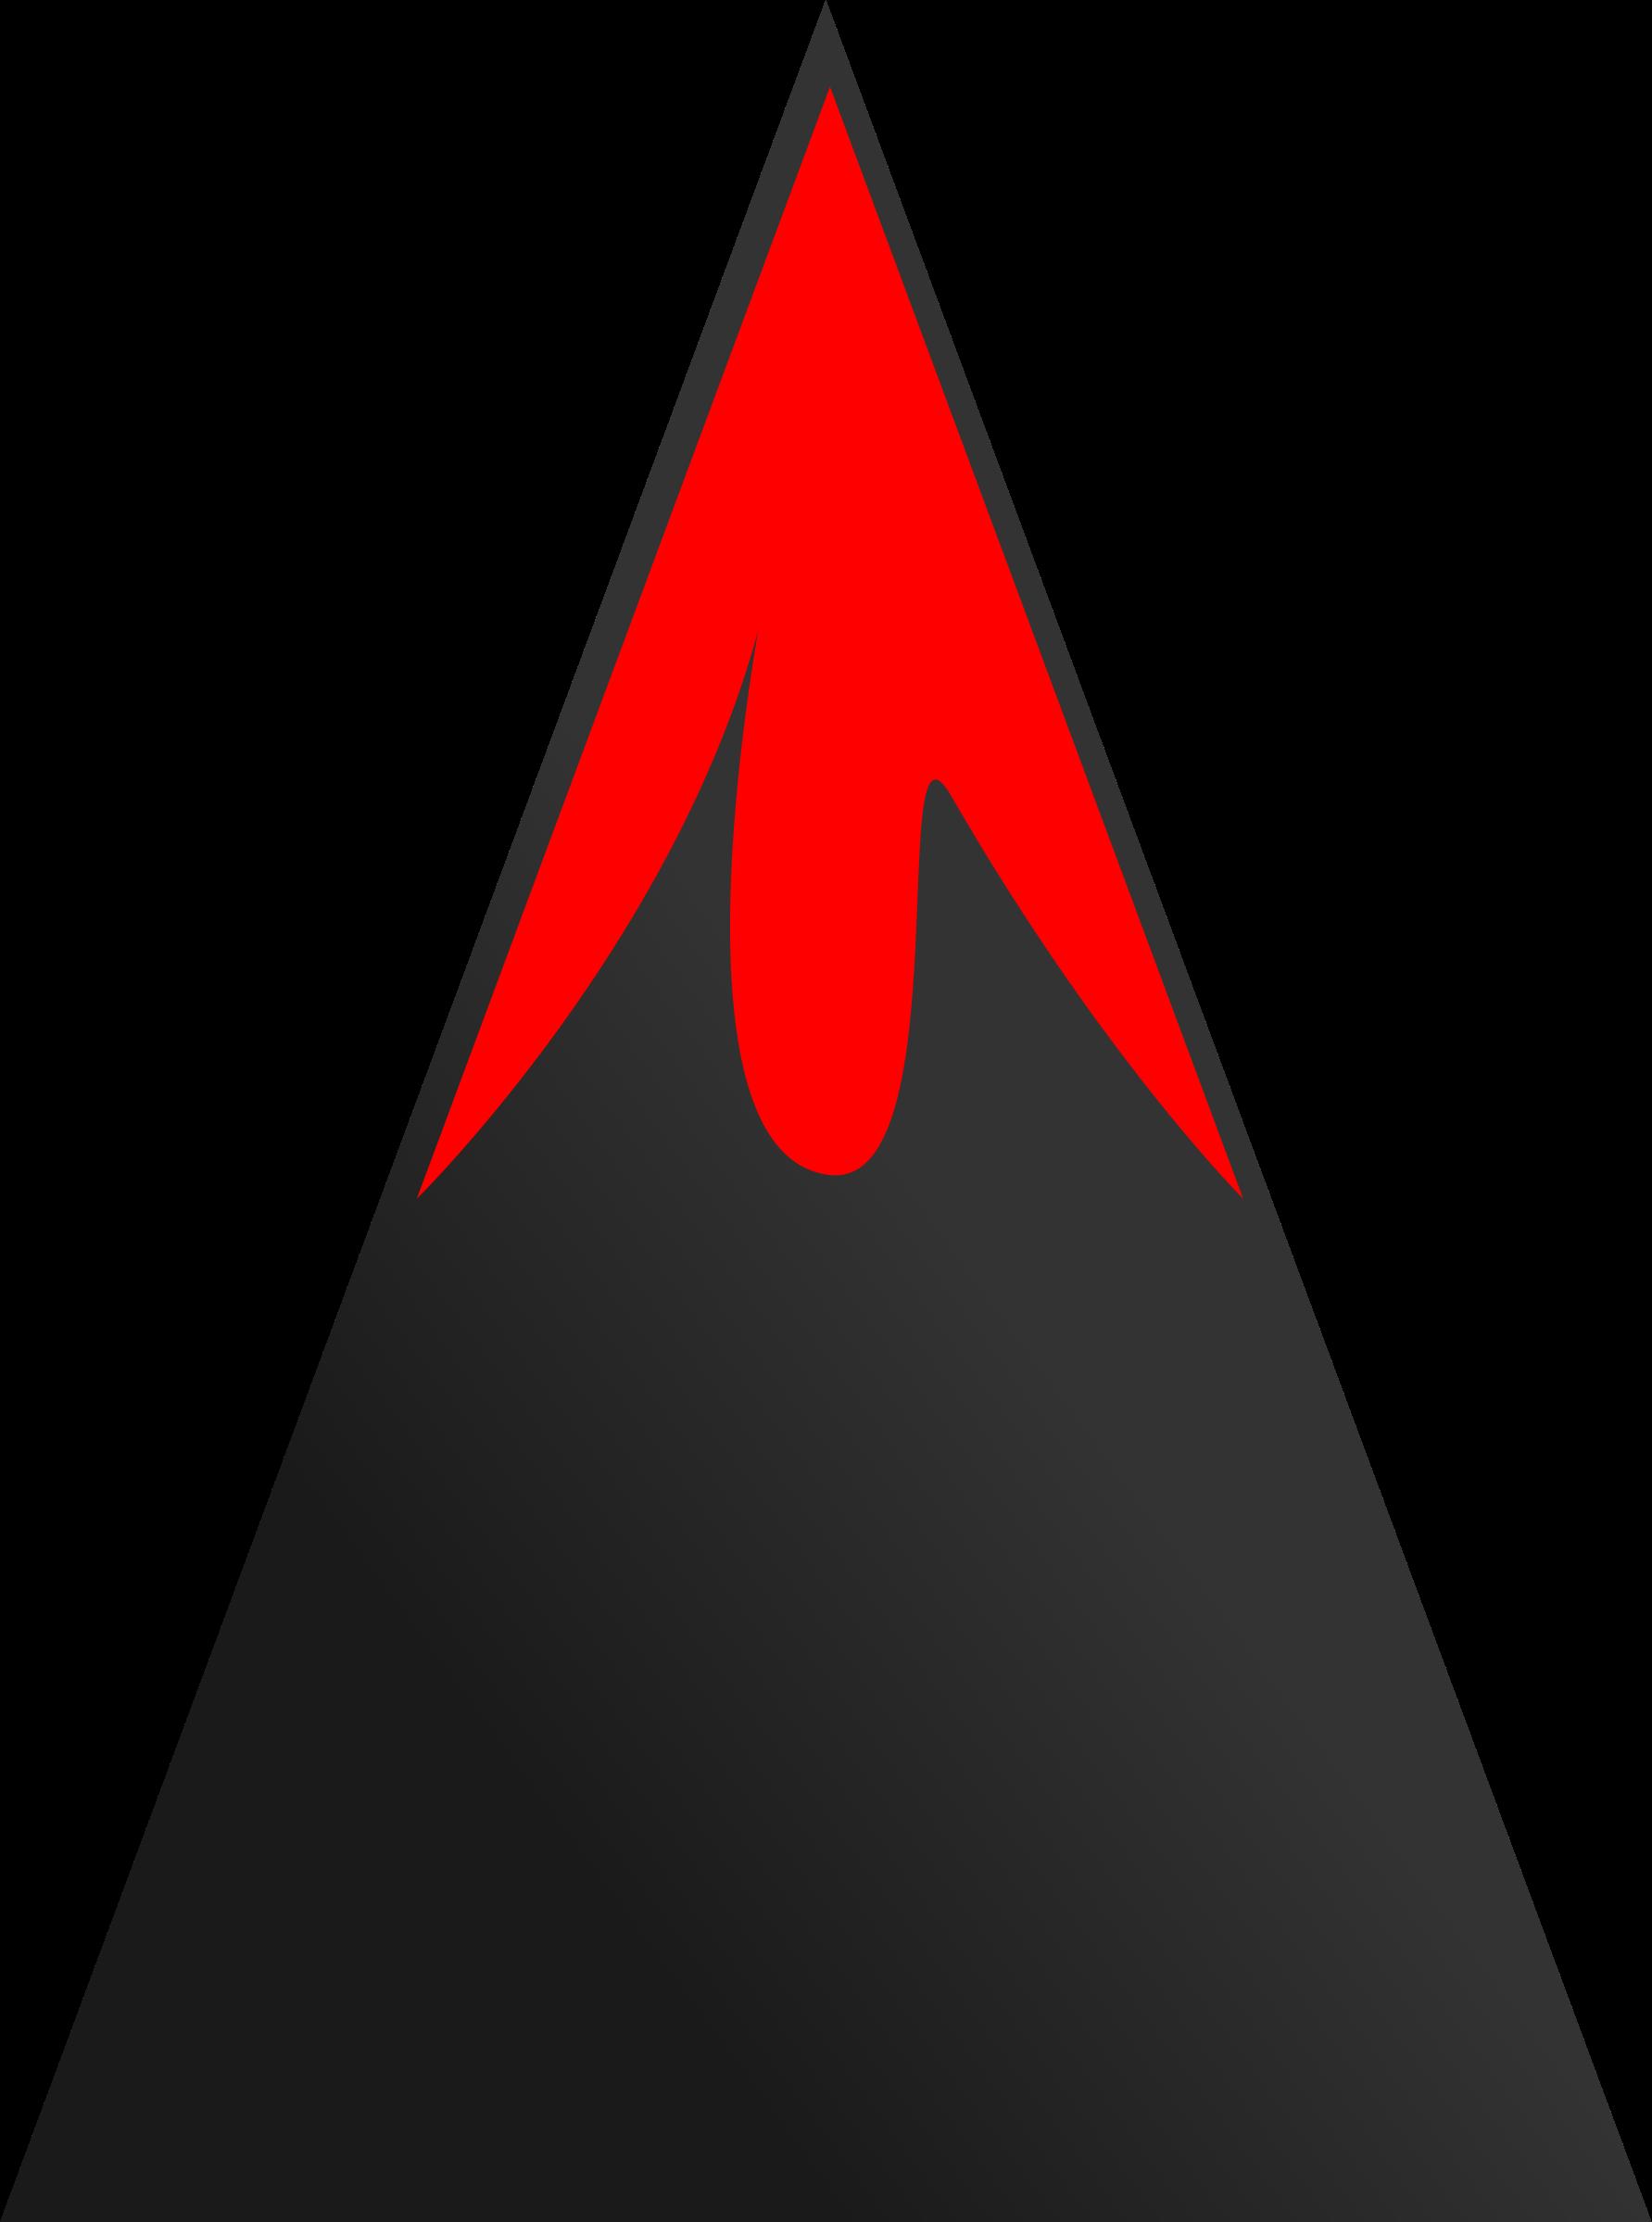 clipart spike